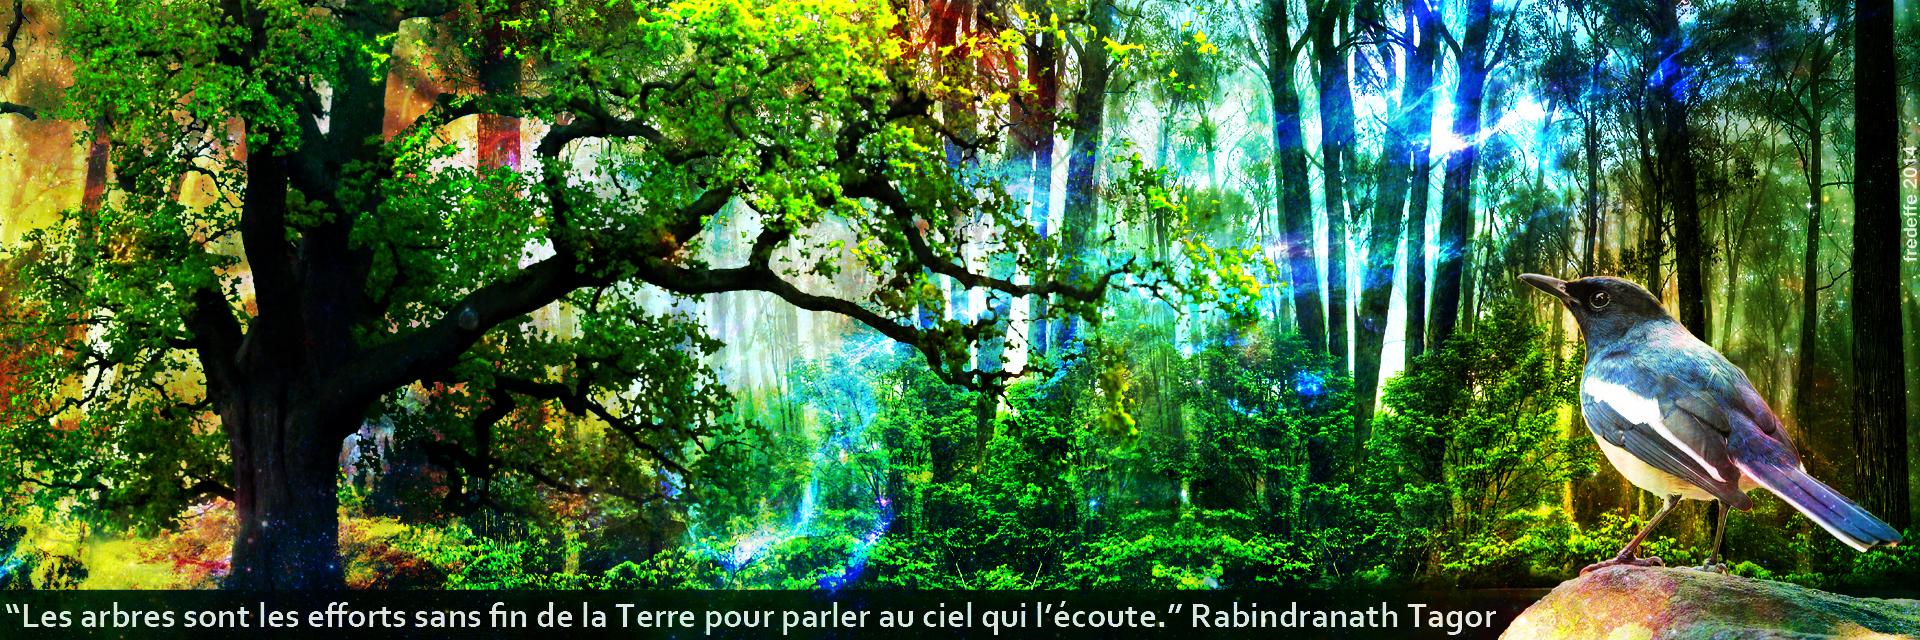 arbres_terre_mere1